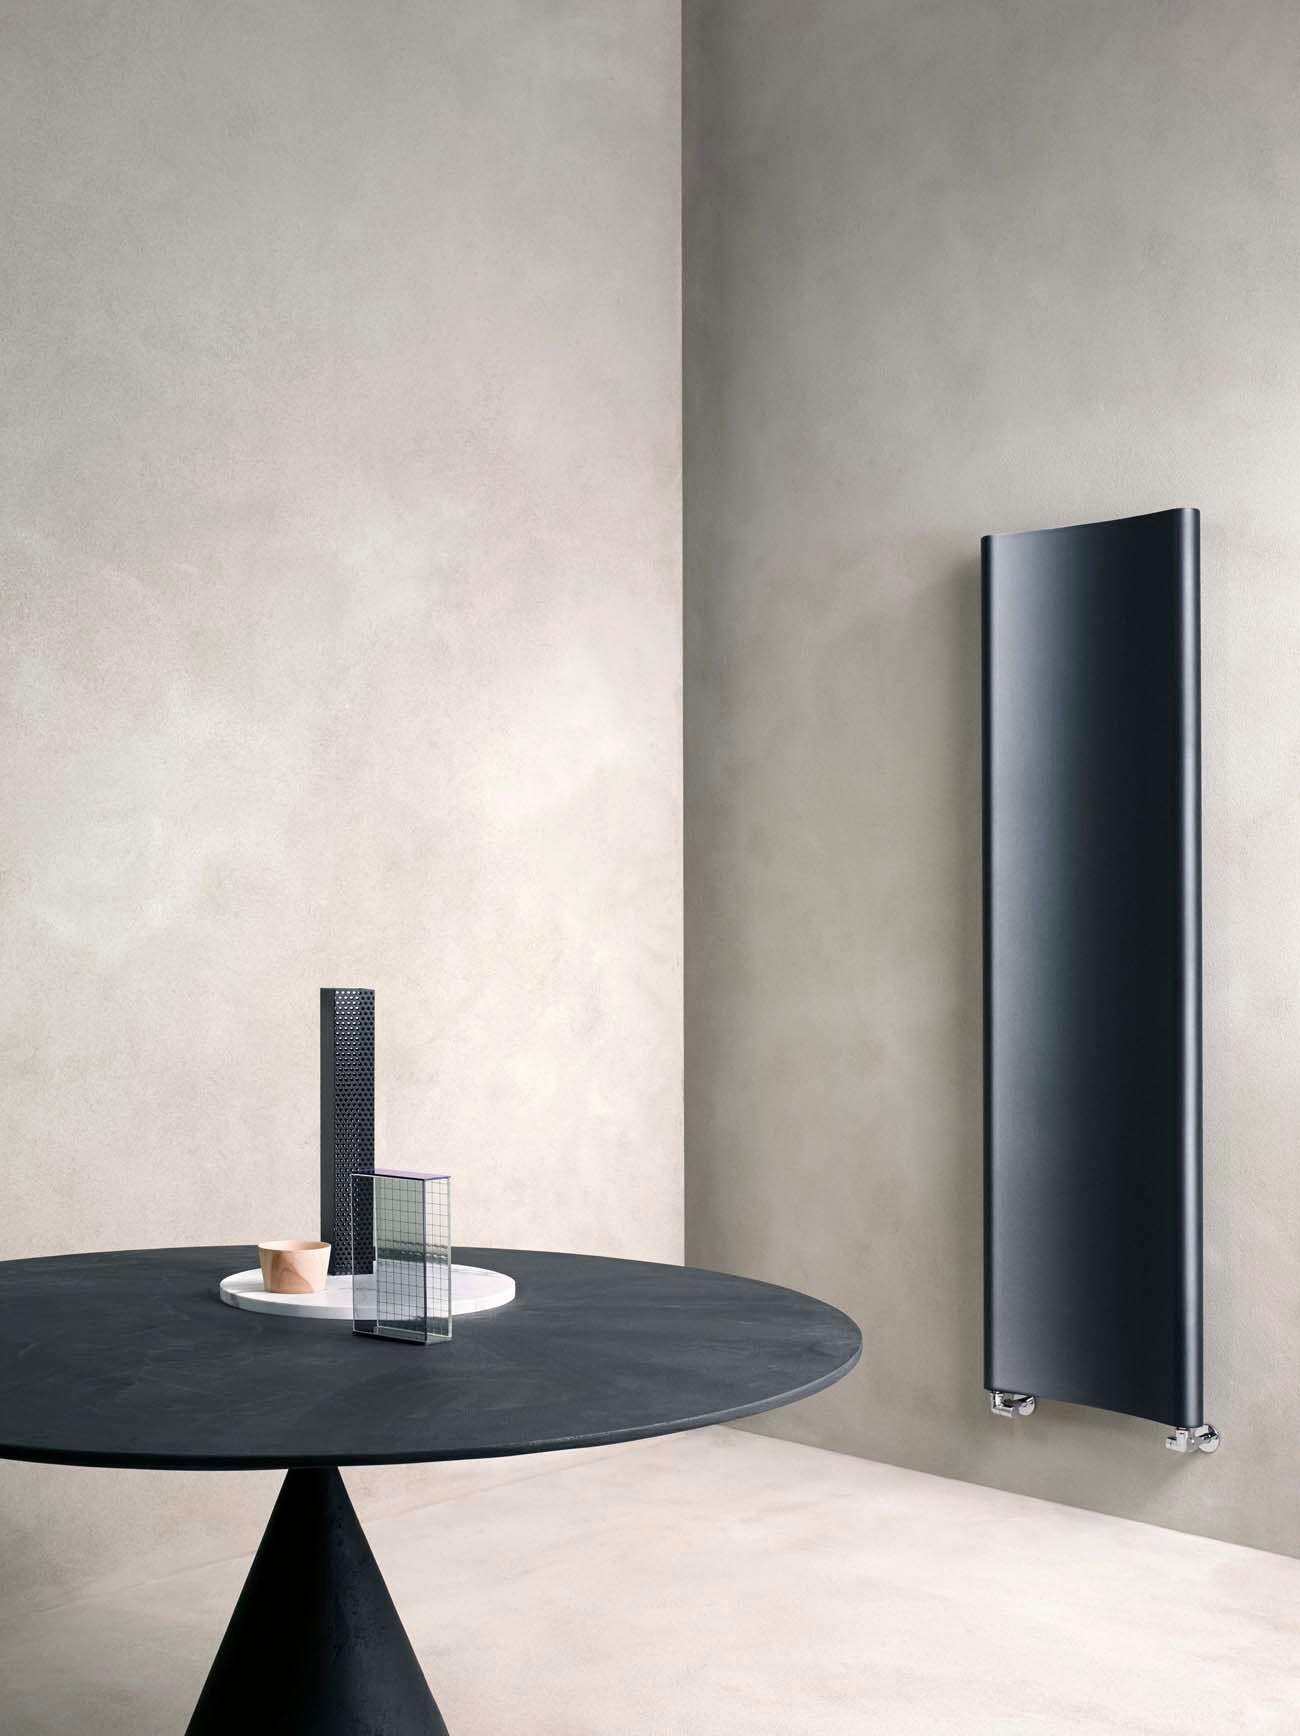 CALEIDO Modèle Bent :un radiateur au design sensuel